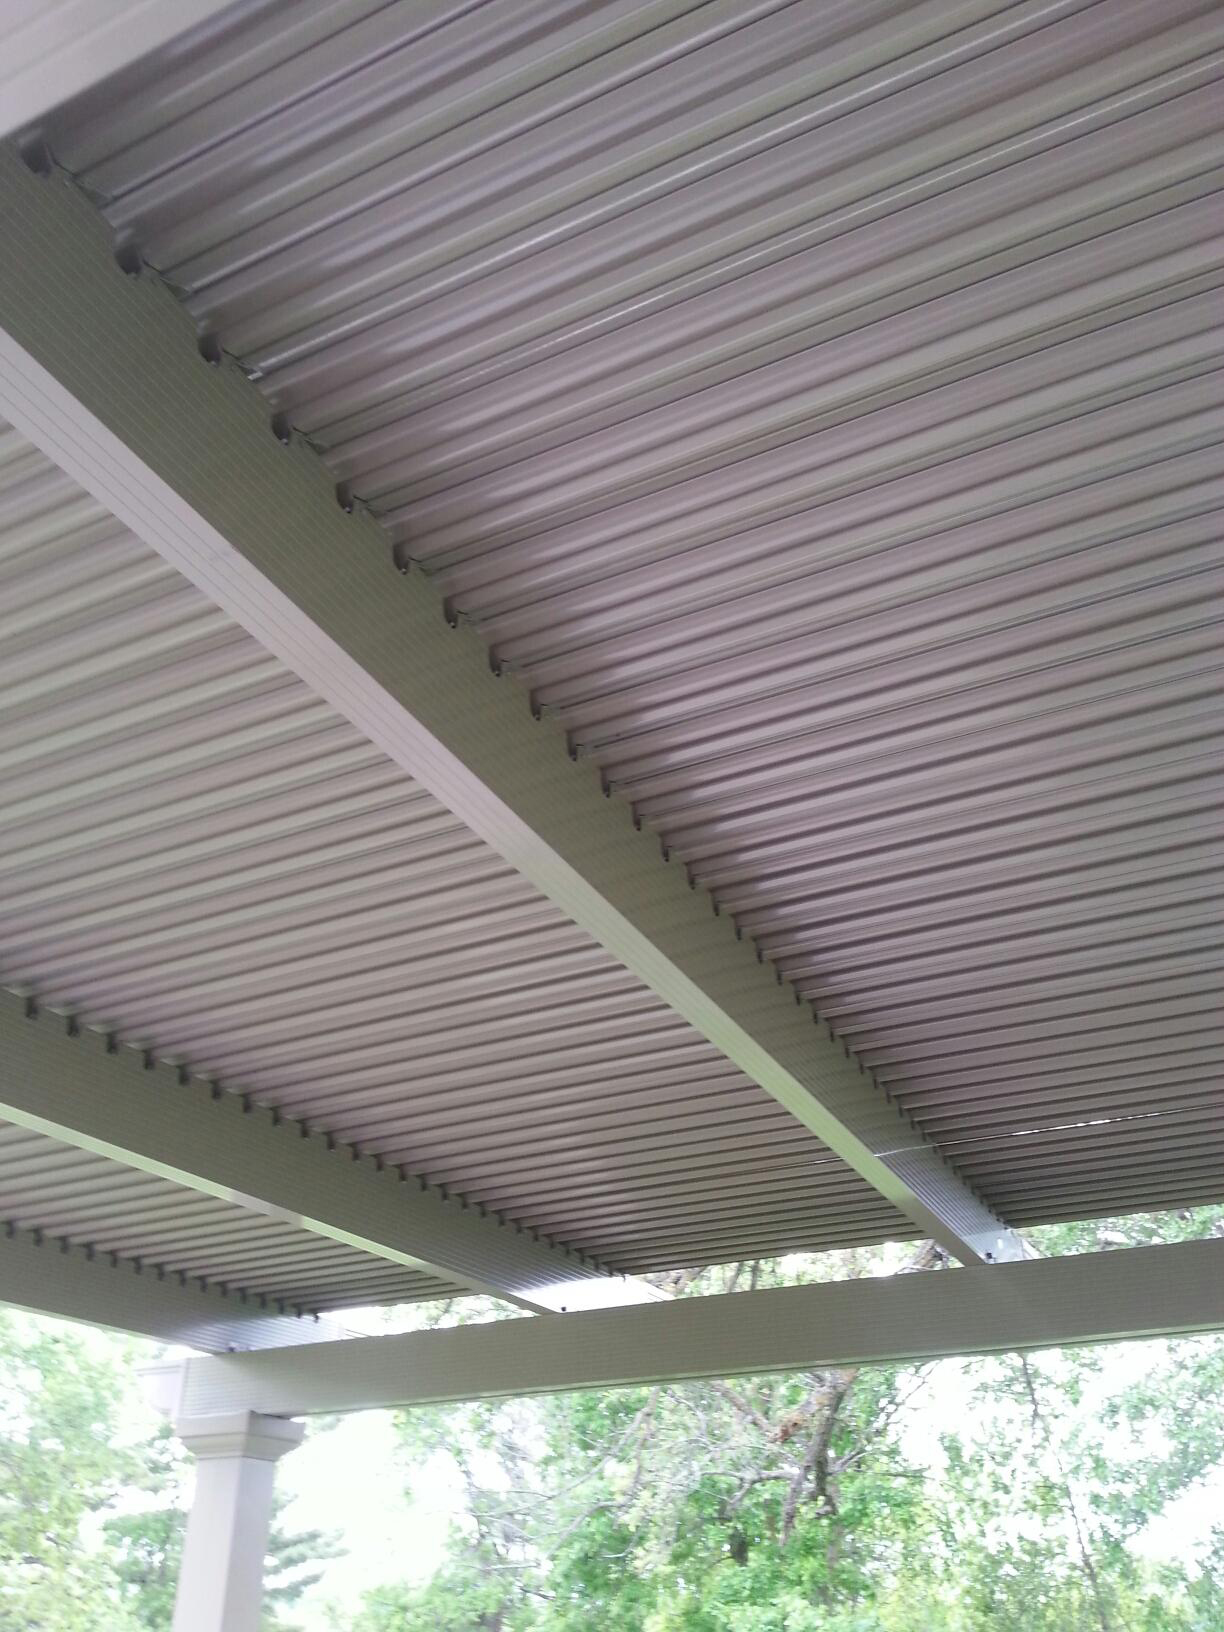 Operable Pergola Electric Adjustable Patio Cover